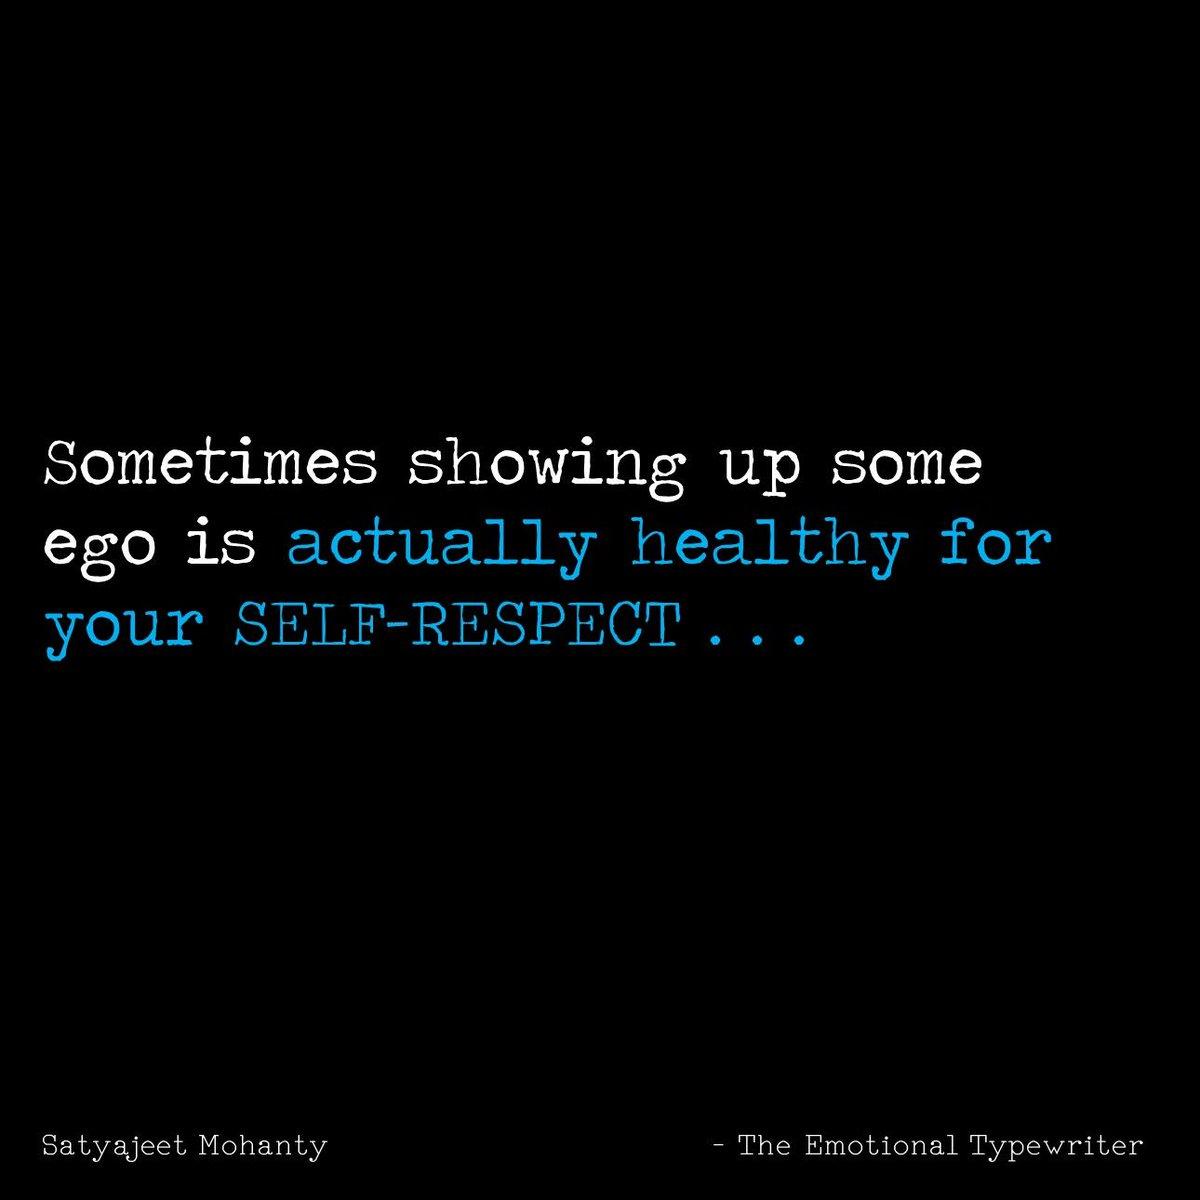 Emotionaltypewriter On Twitter Tet Theemotionaltypewriter Ego